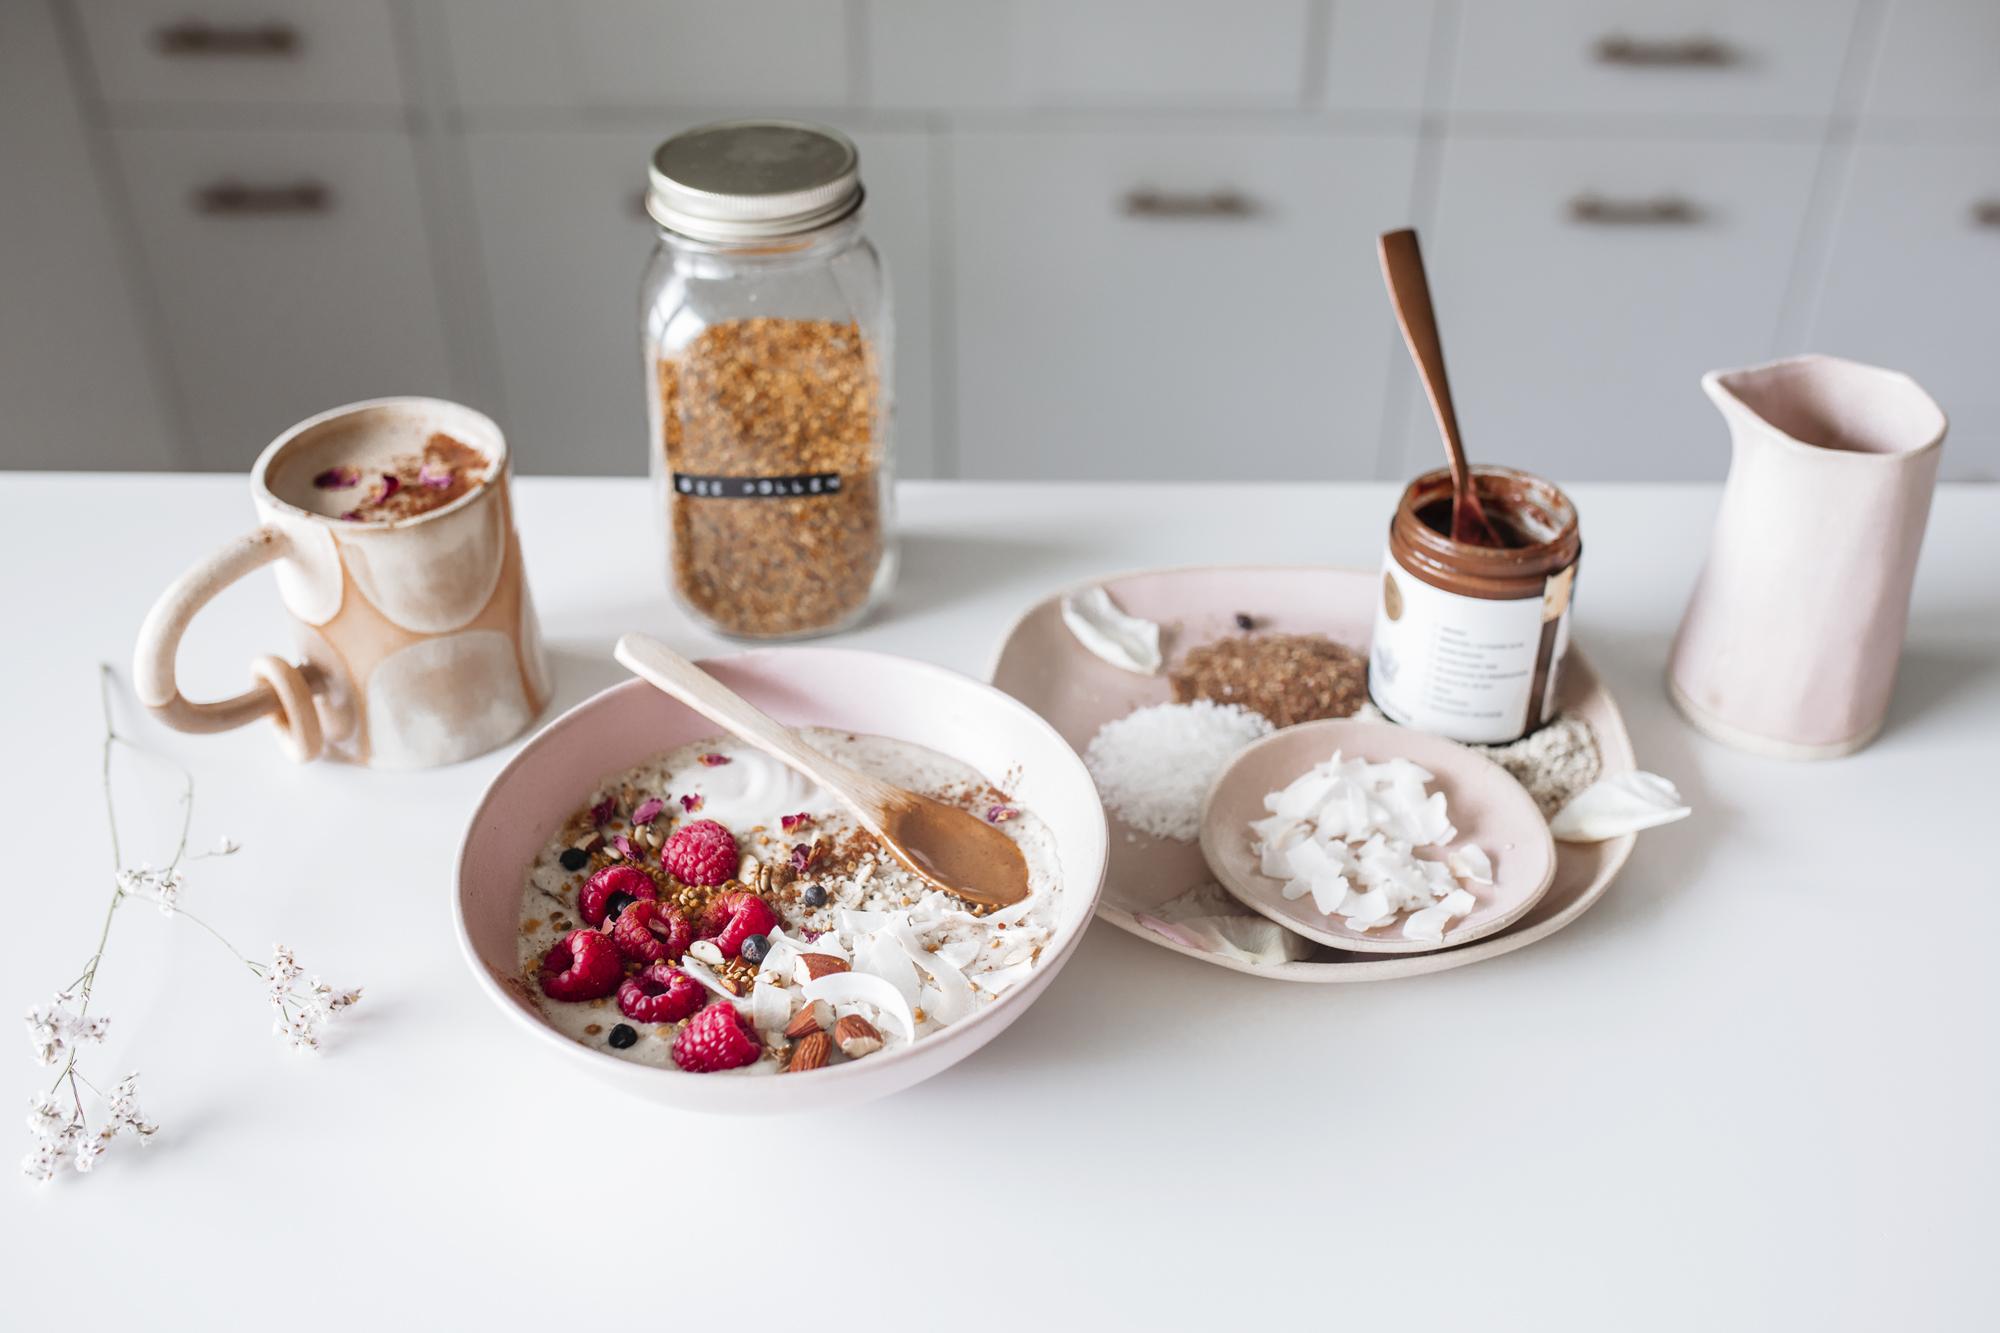 emilyrhess-breakfast-bircher-beauty-boosting-recipe (5).jpg